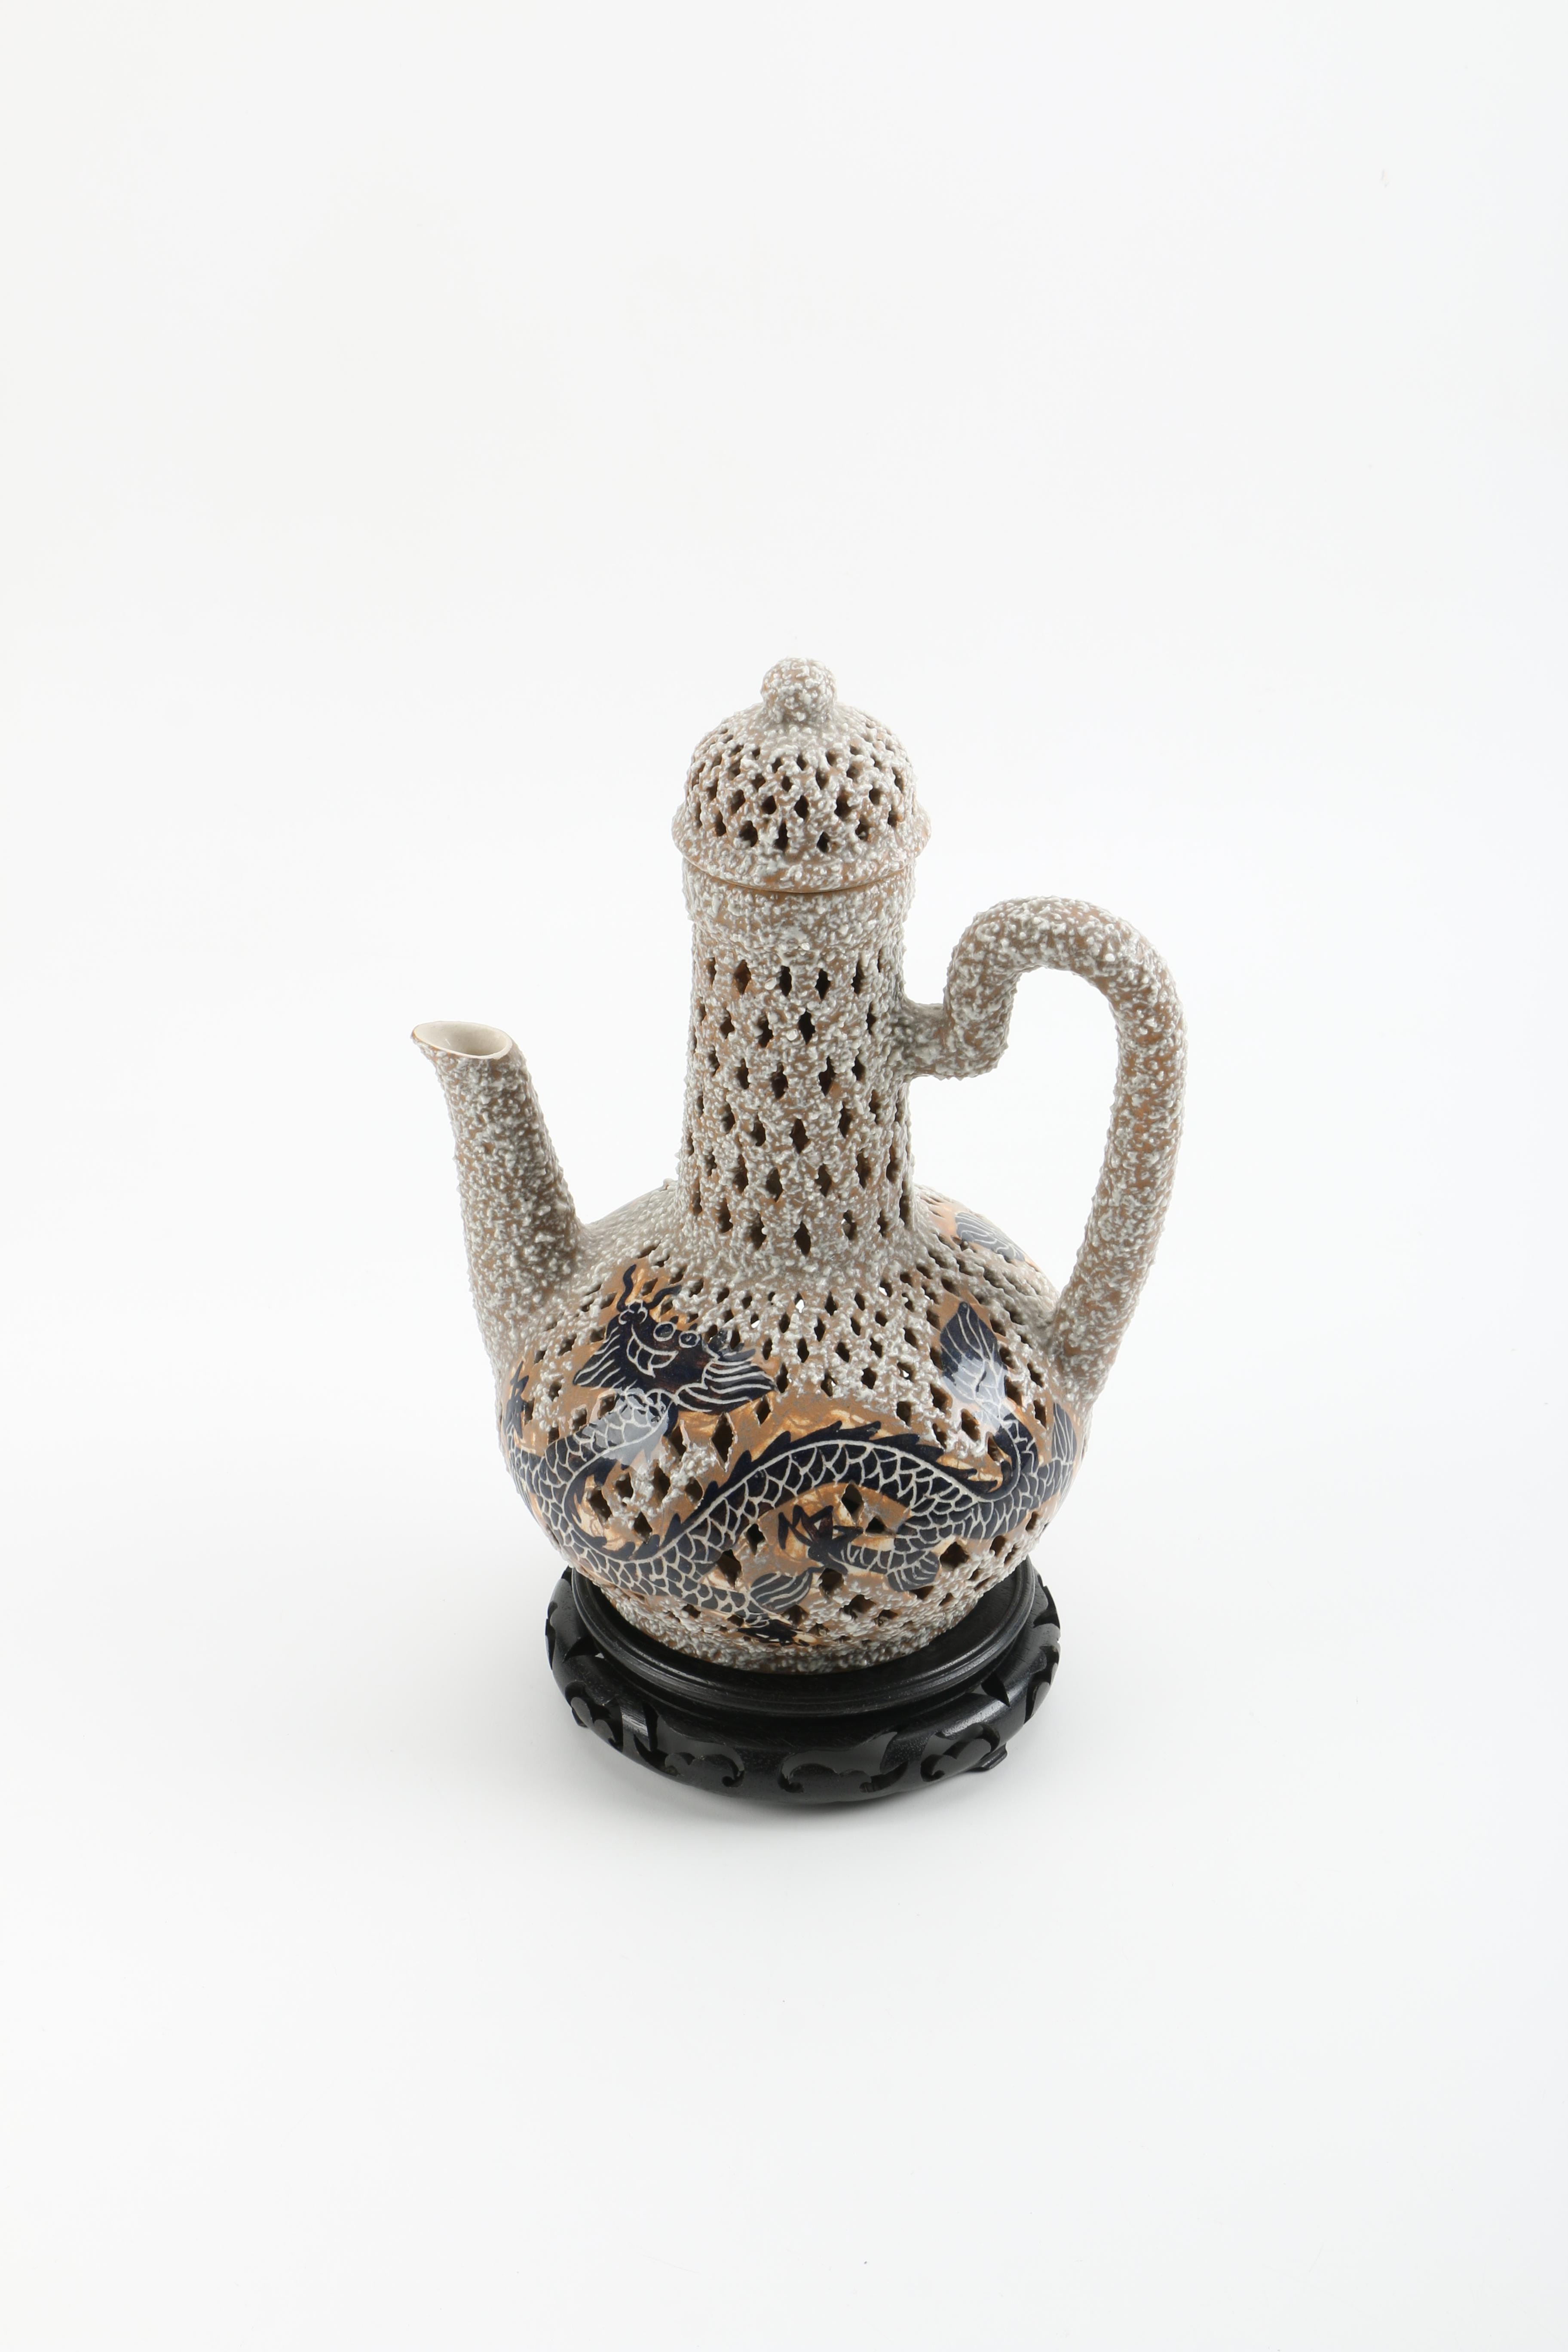 Decorative Pierced Taiwanese Coffee Pot